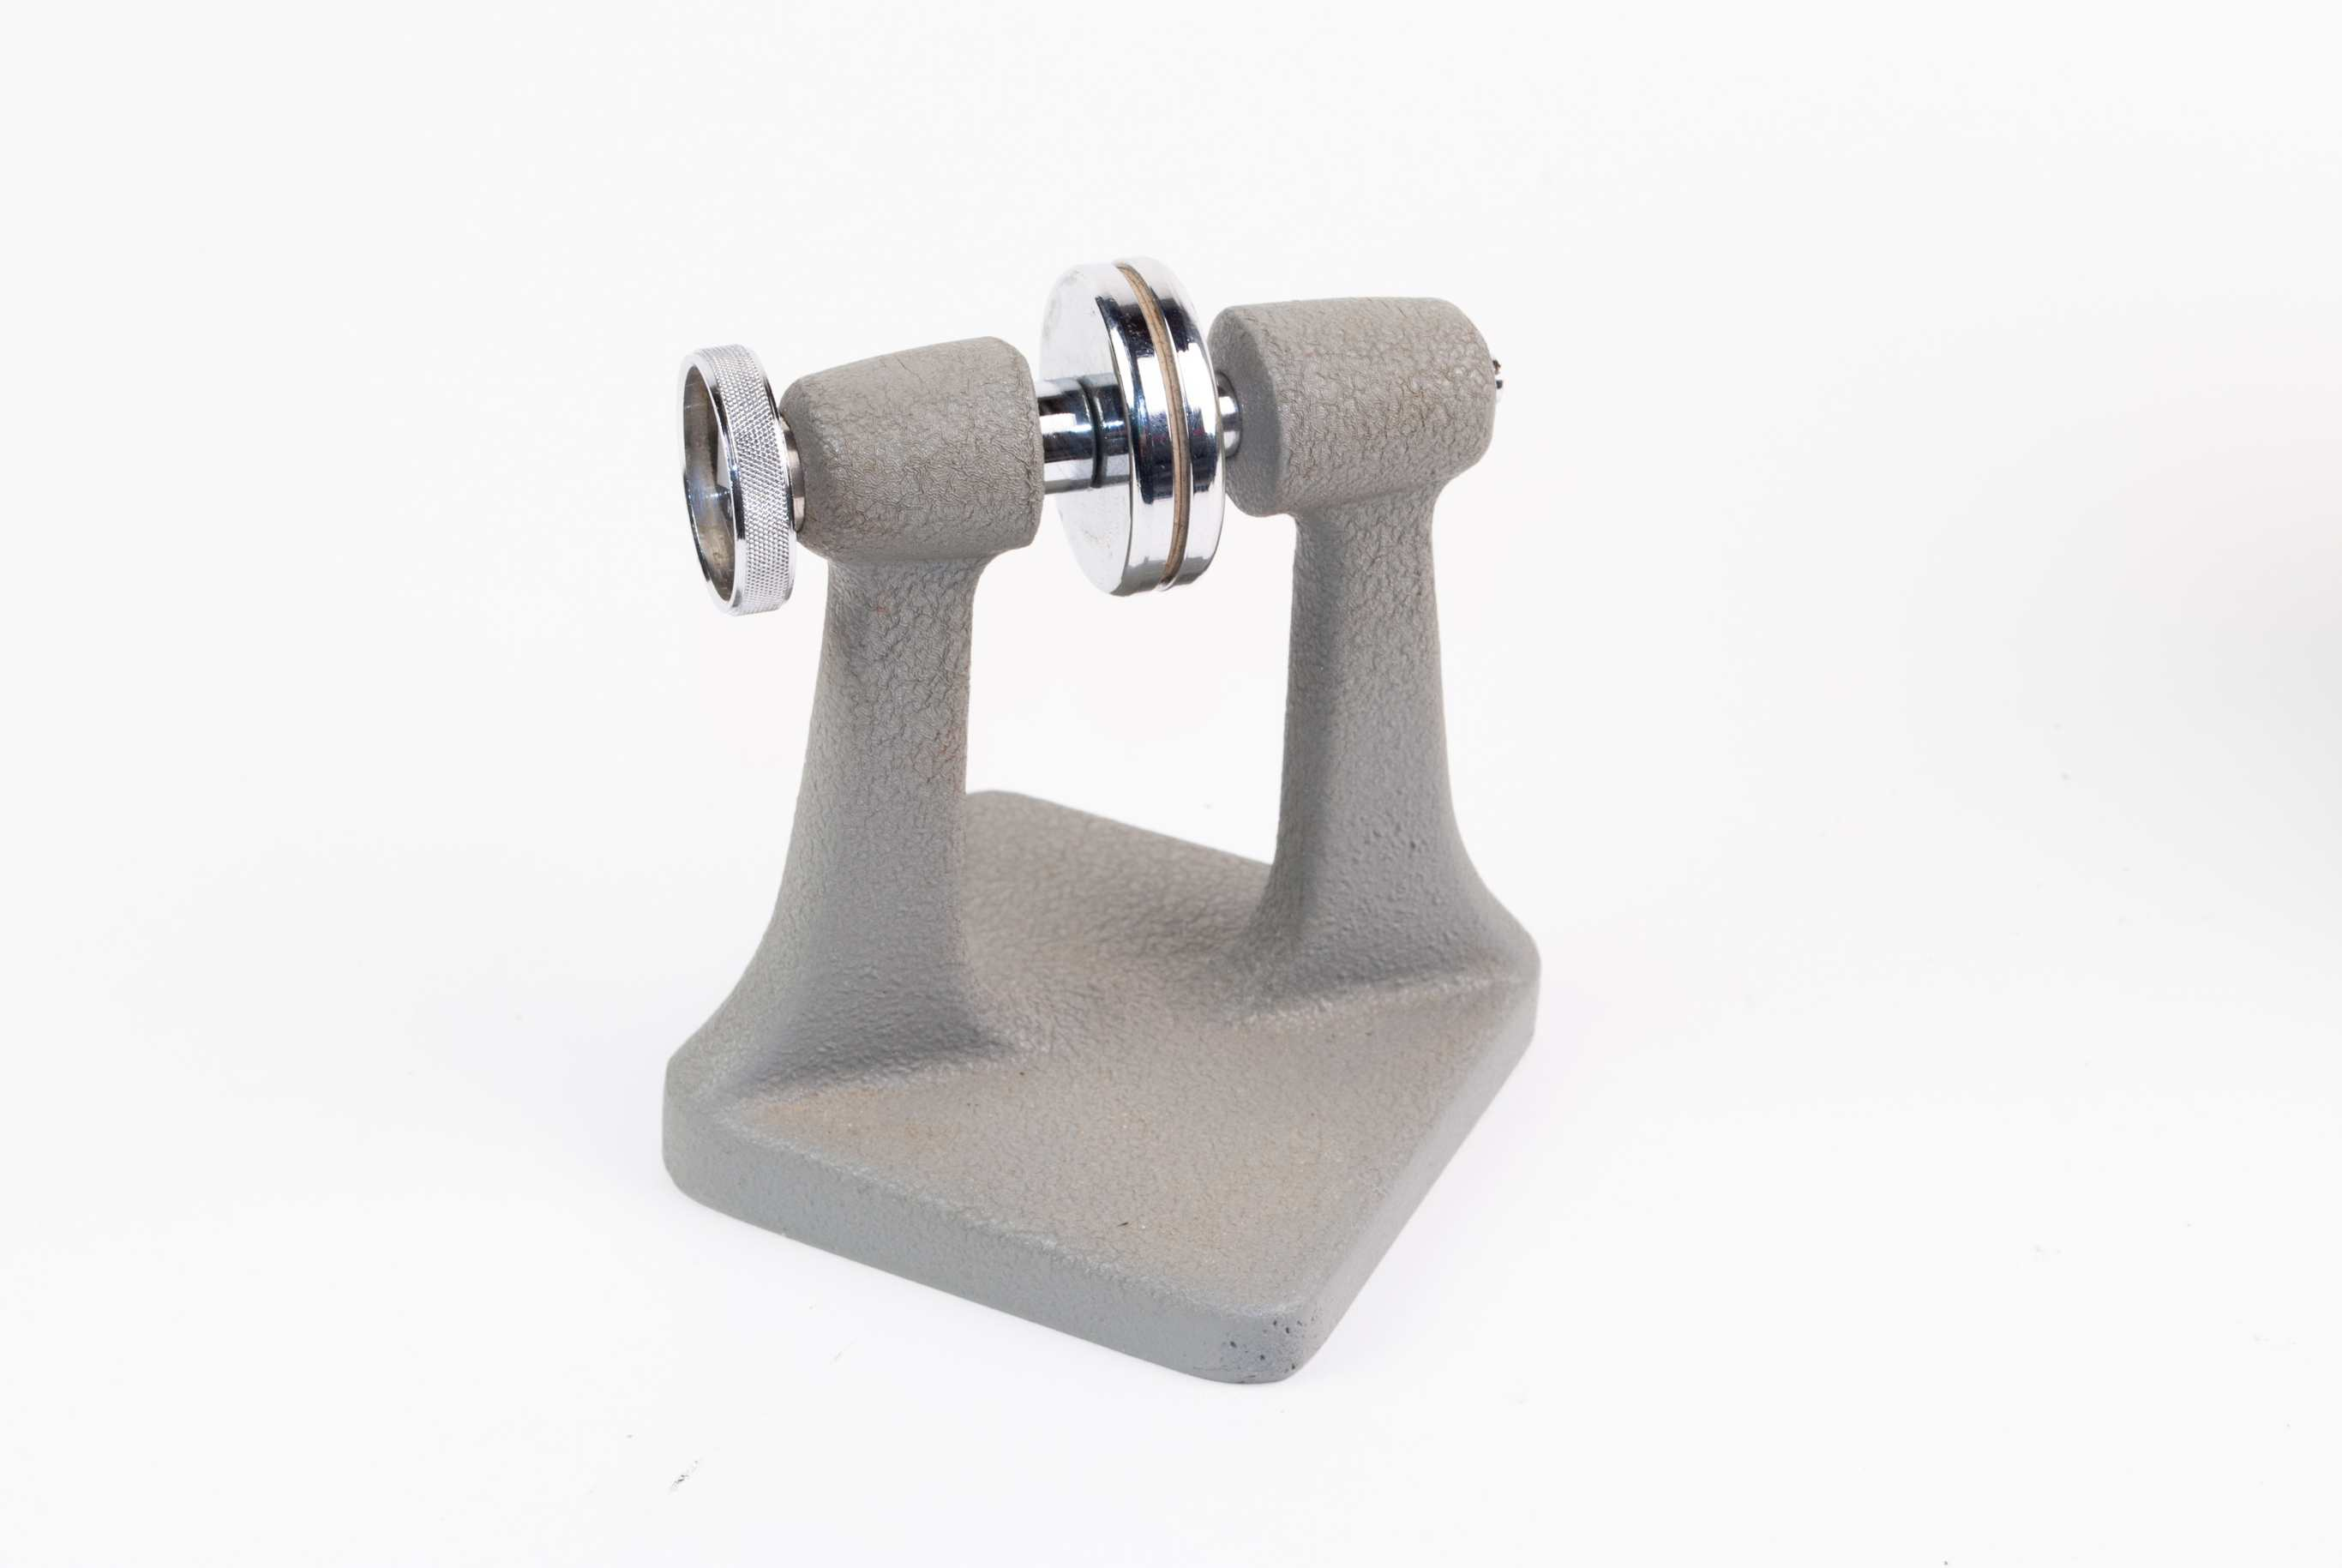 Diaklem - slide clamb